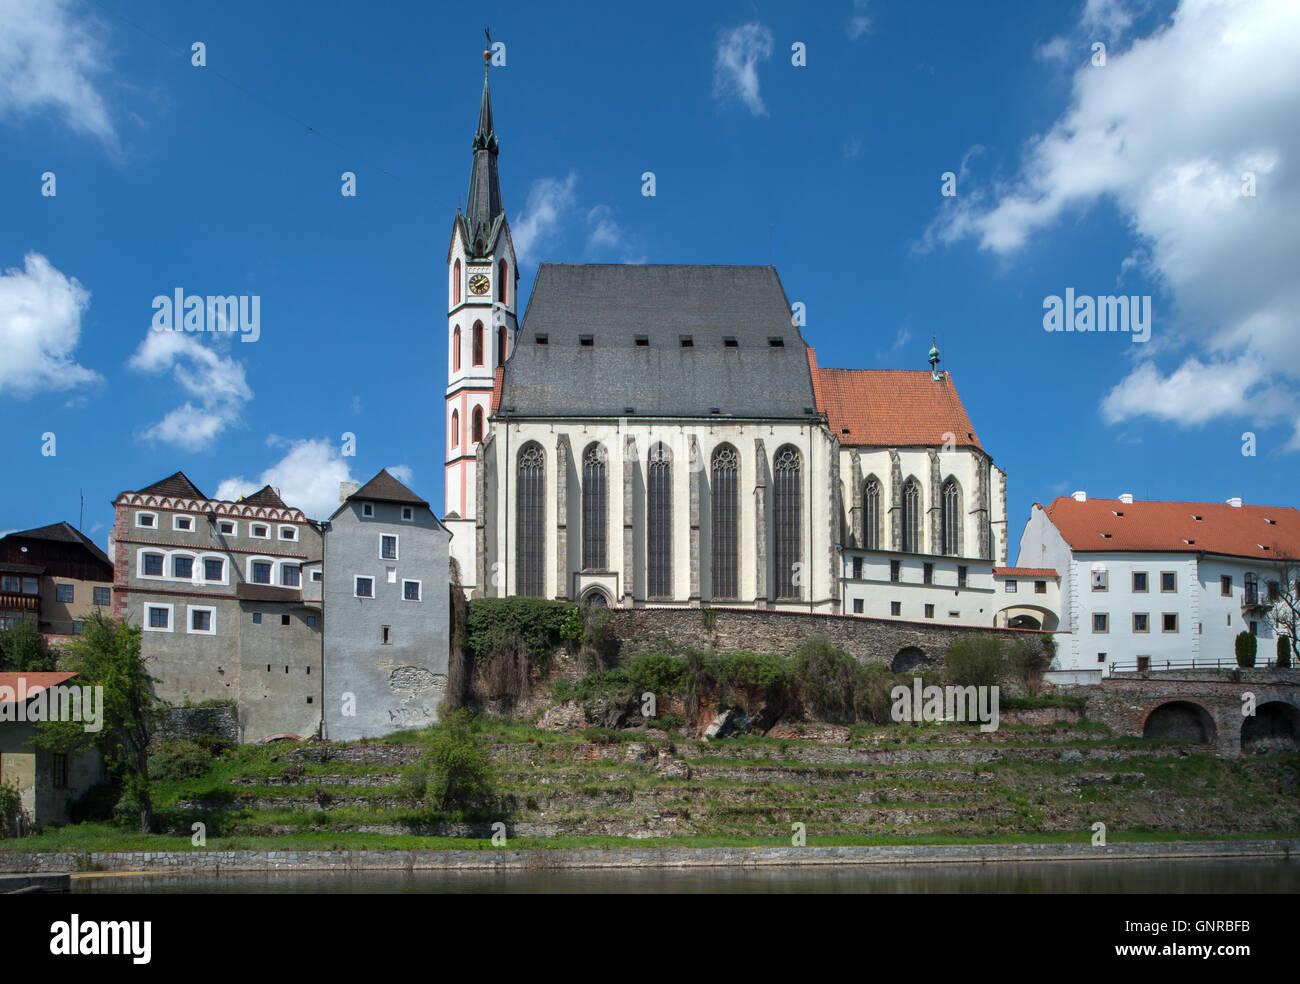 Cesky Krumlov, Czech Republic, overlooking the St  Vitus